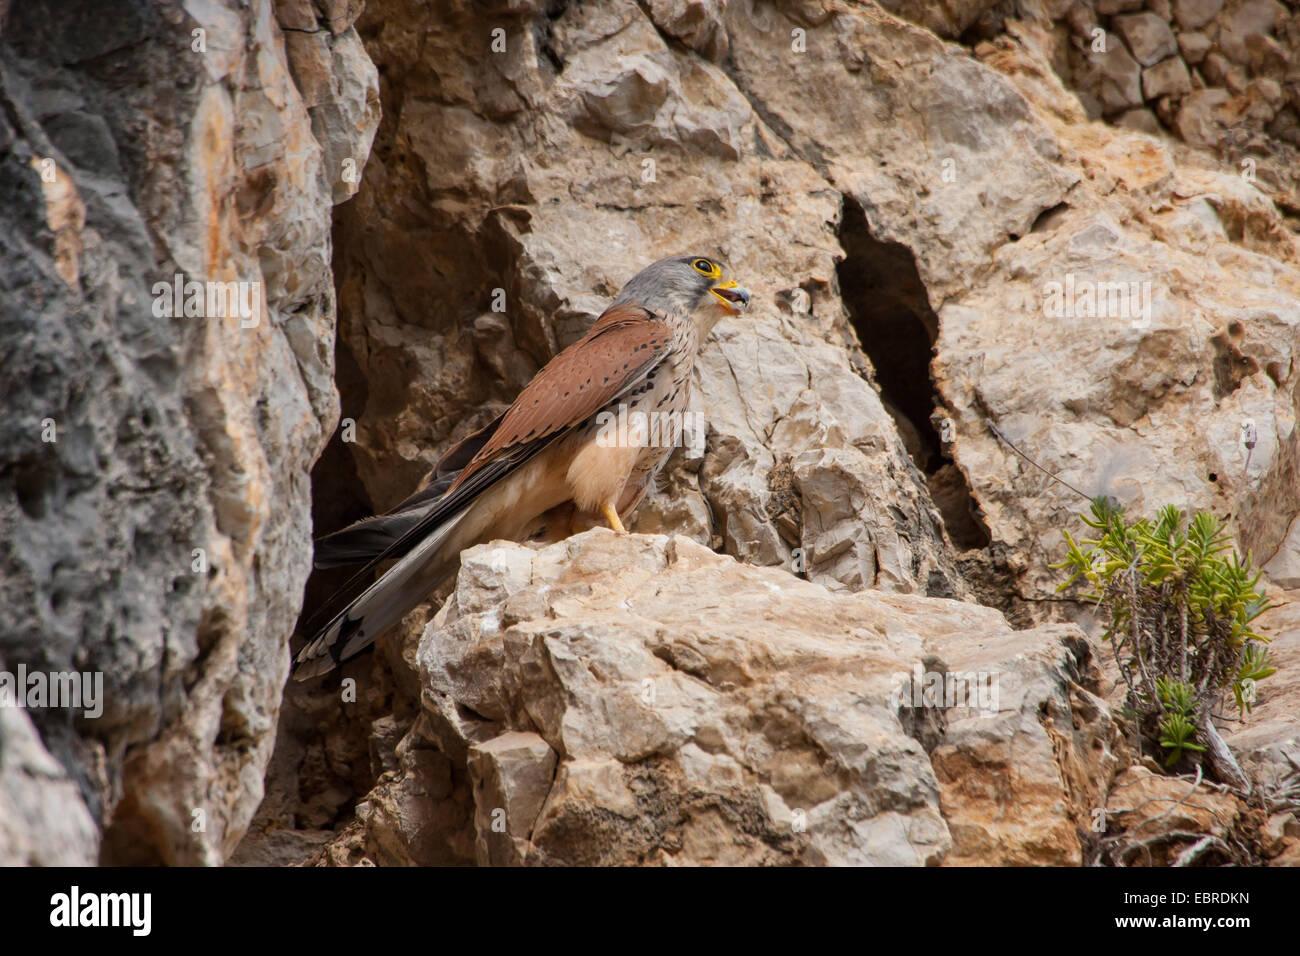 European Kestrel, Eurasian Kestrel, Old World Kestrel, Common Kestrel (Falco tinnunculus), male sits on a ledge, - Stock Image